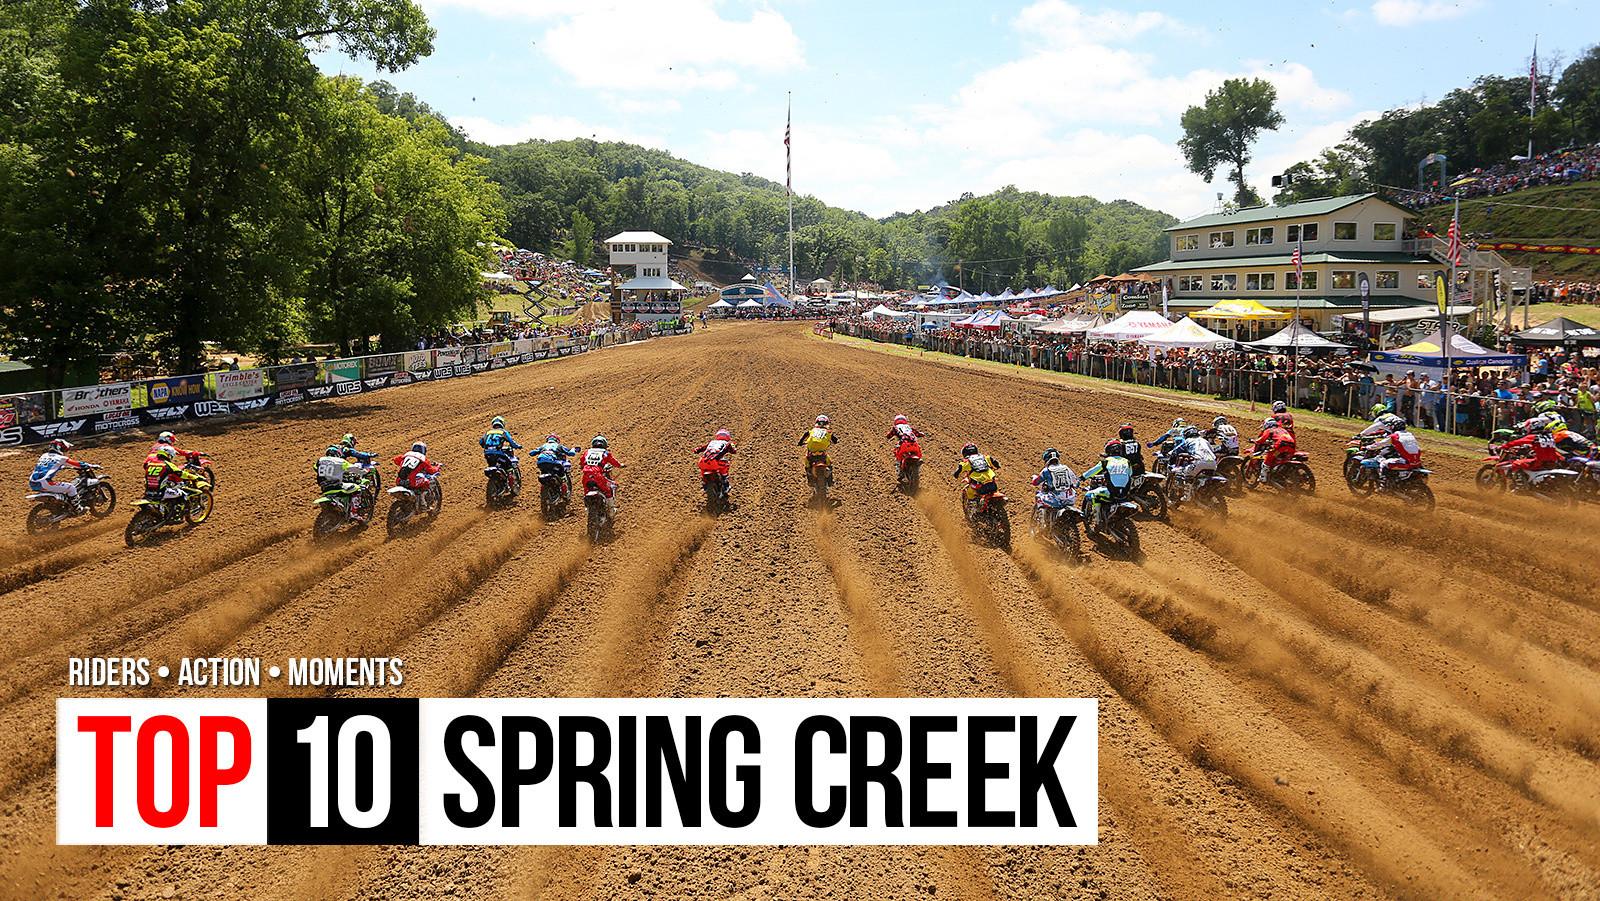 Top 10: Spring Creek